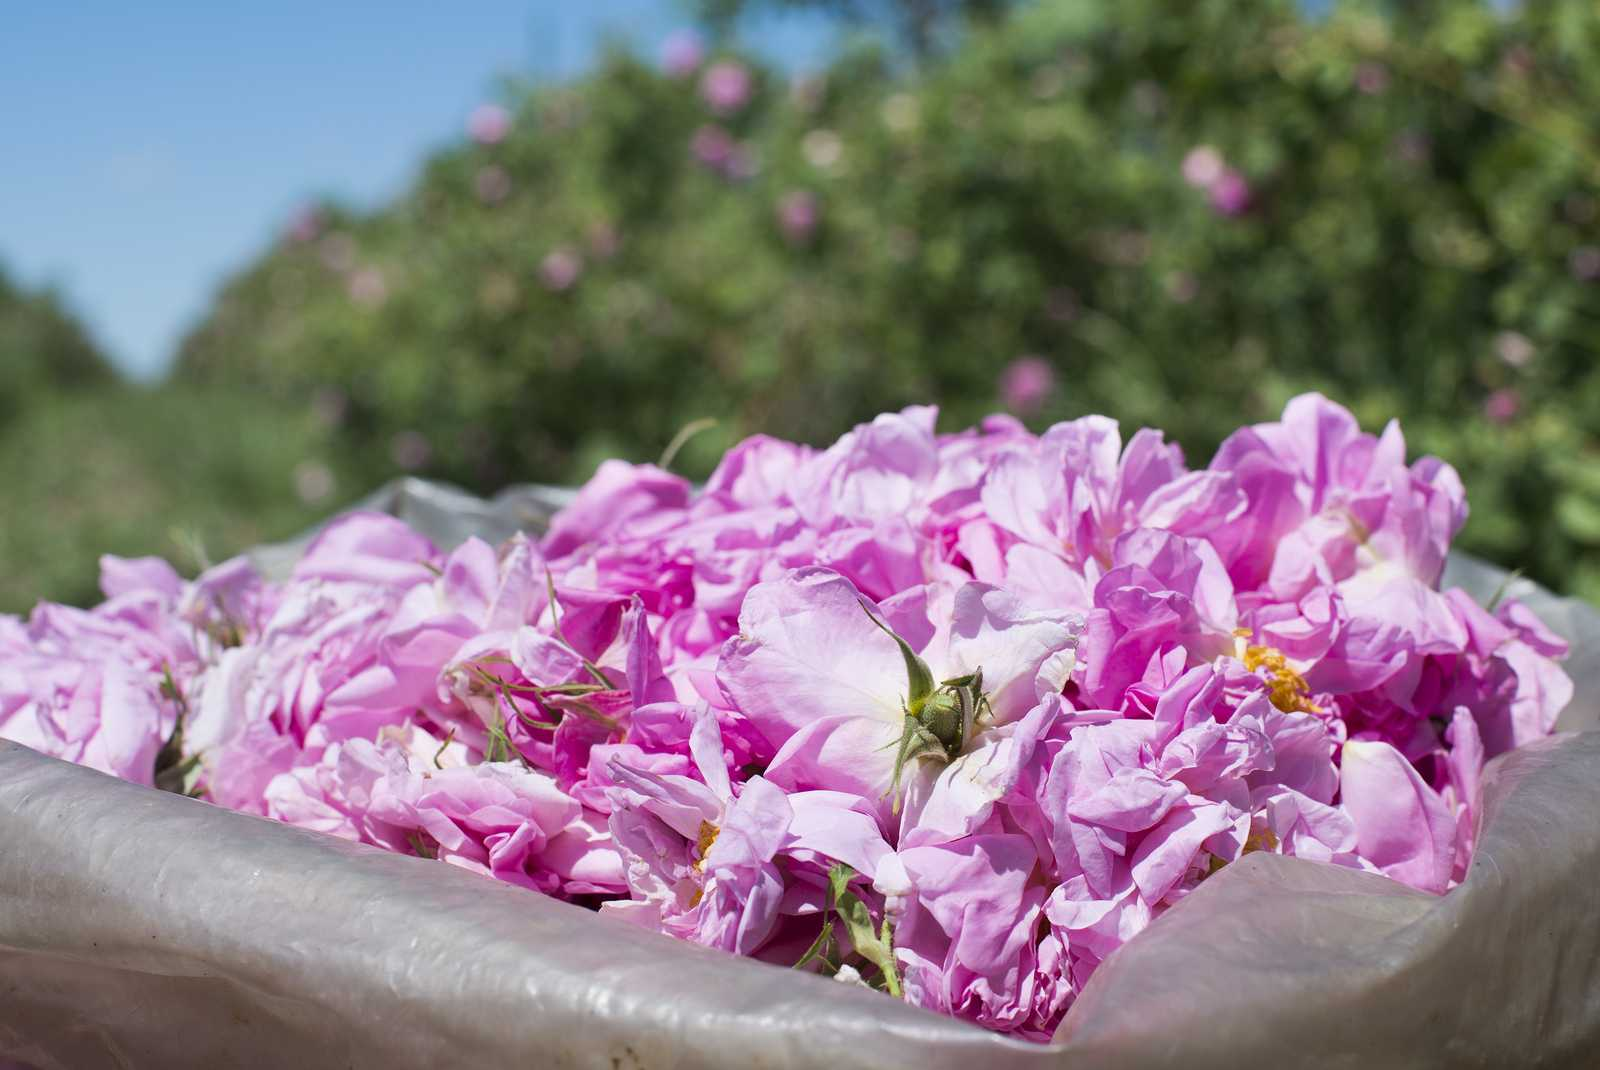 la rosa damscena ingrediente cosmesi coreana